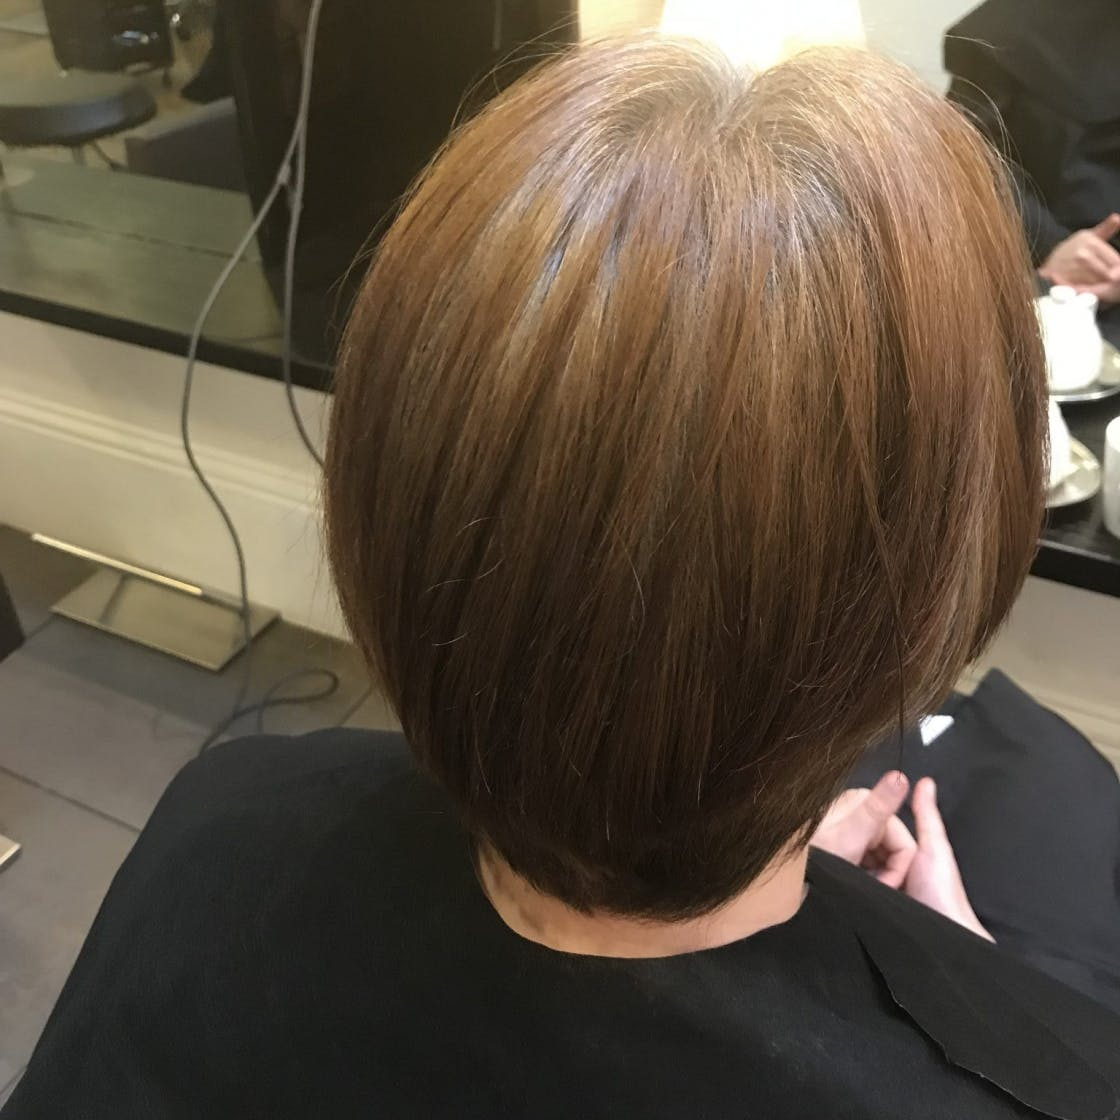 Blonde Hair Advice How To Bleach Dark Brown Hair Safely